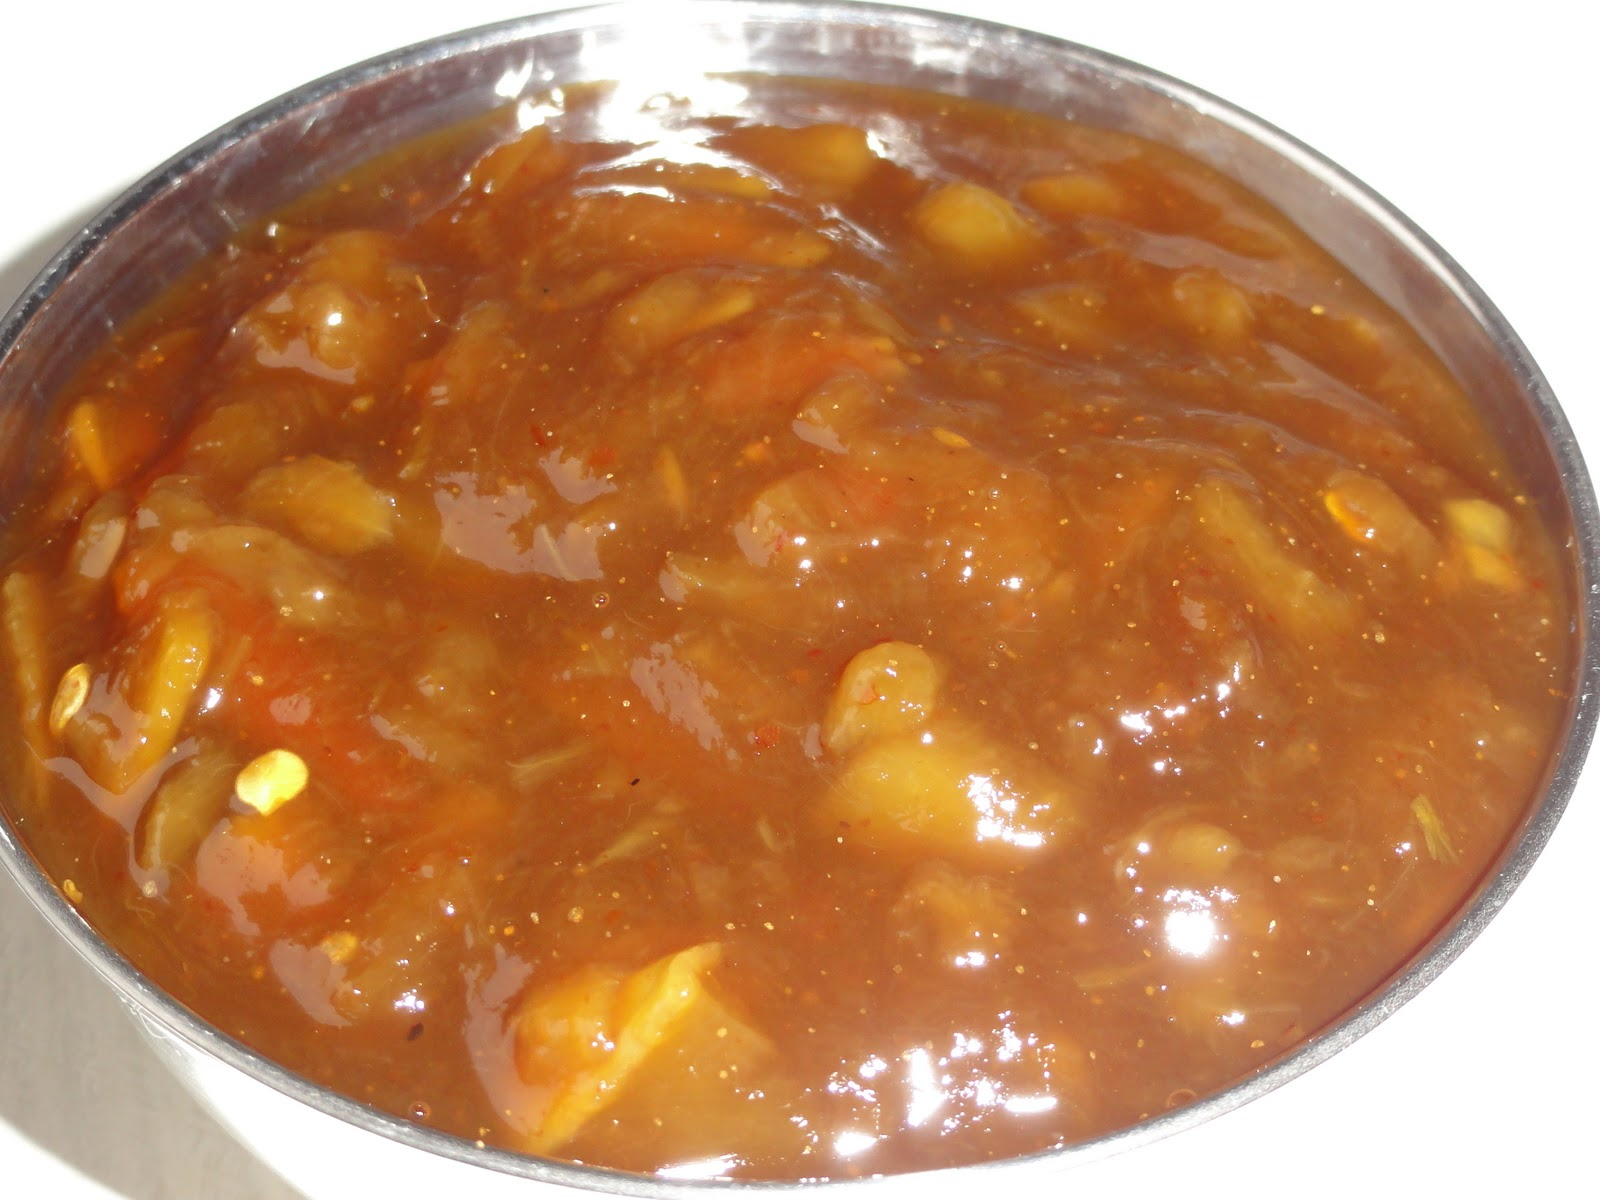 Rathai's Recipes: Mango chutney (mangai pachadi)